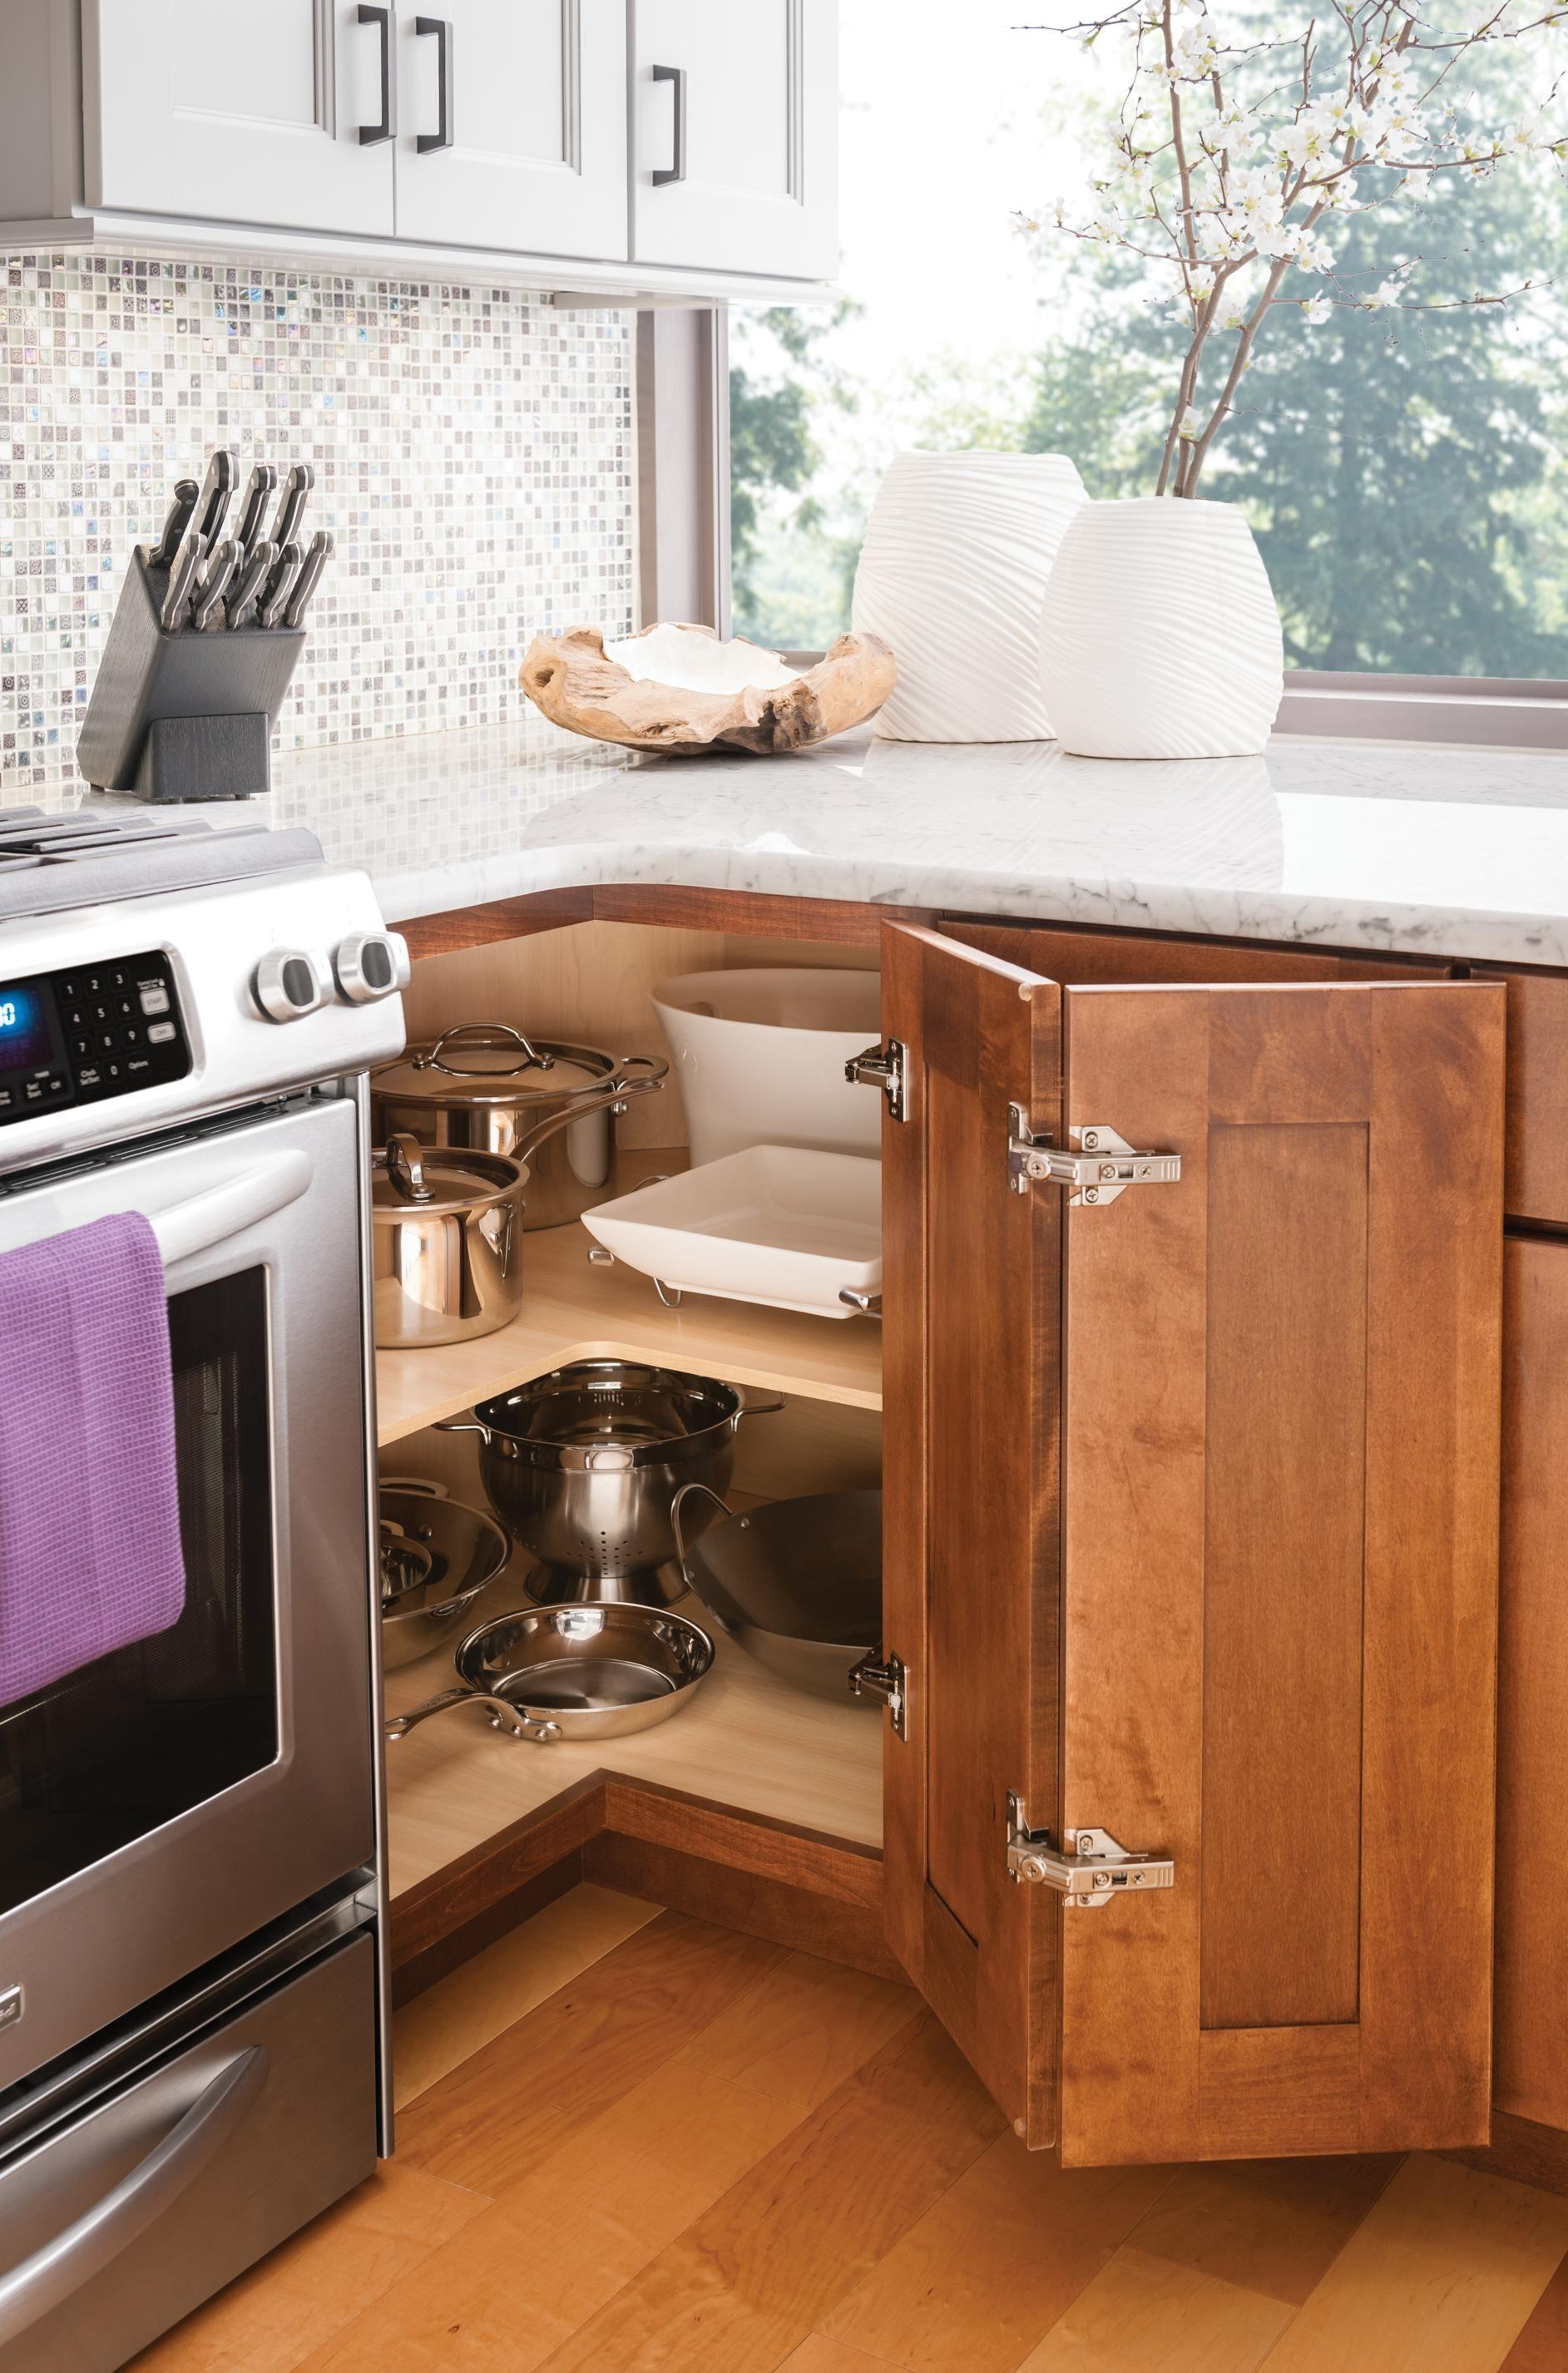 Easy Reach Square Corner Base Cabinet Medallion At Menards Cabinets Kitchen Cabinet Plans Unfinished Kitchen Cabinets Kitchen Design